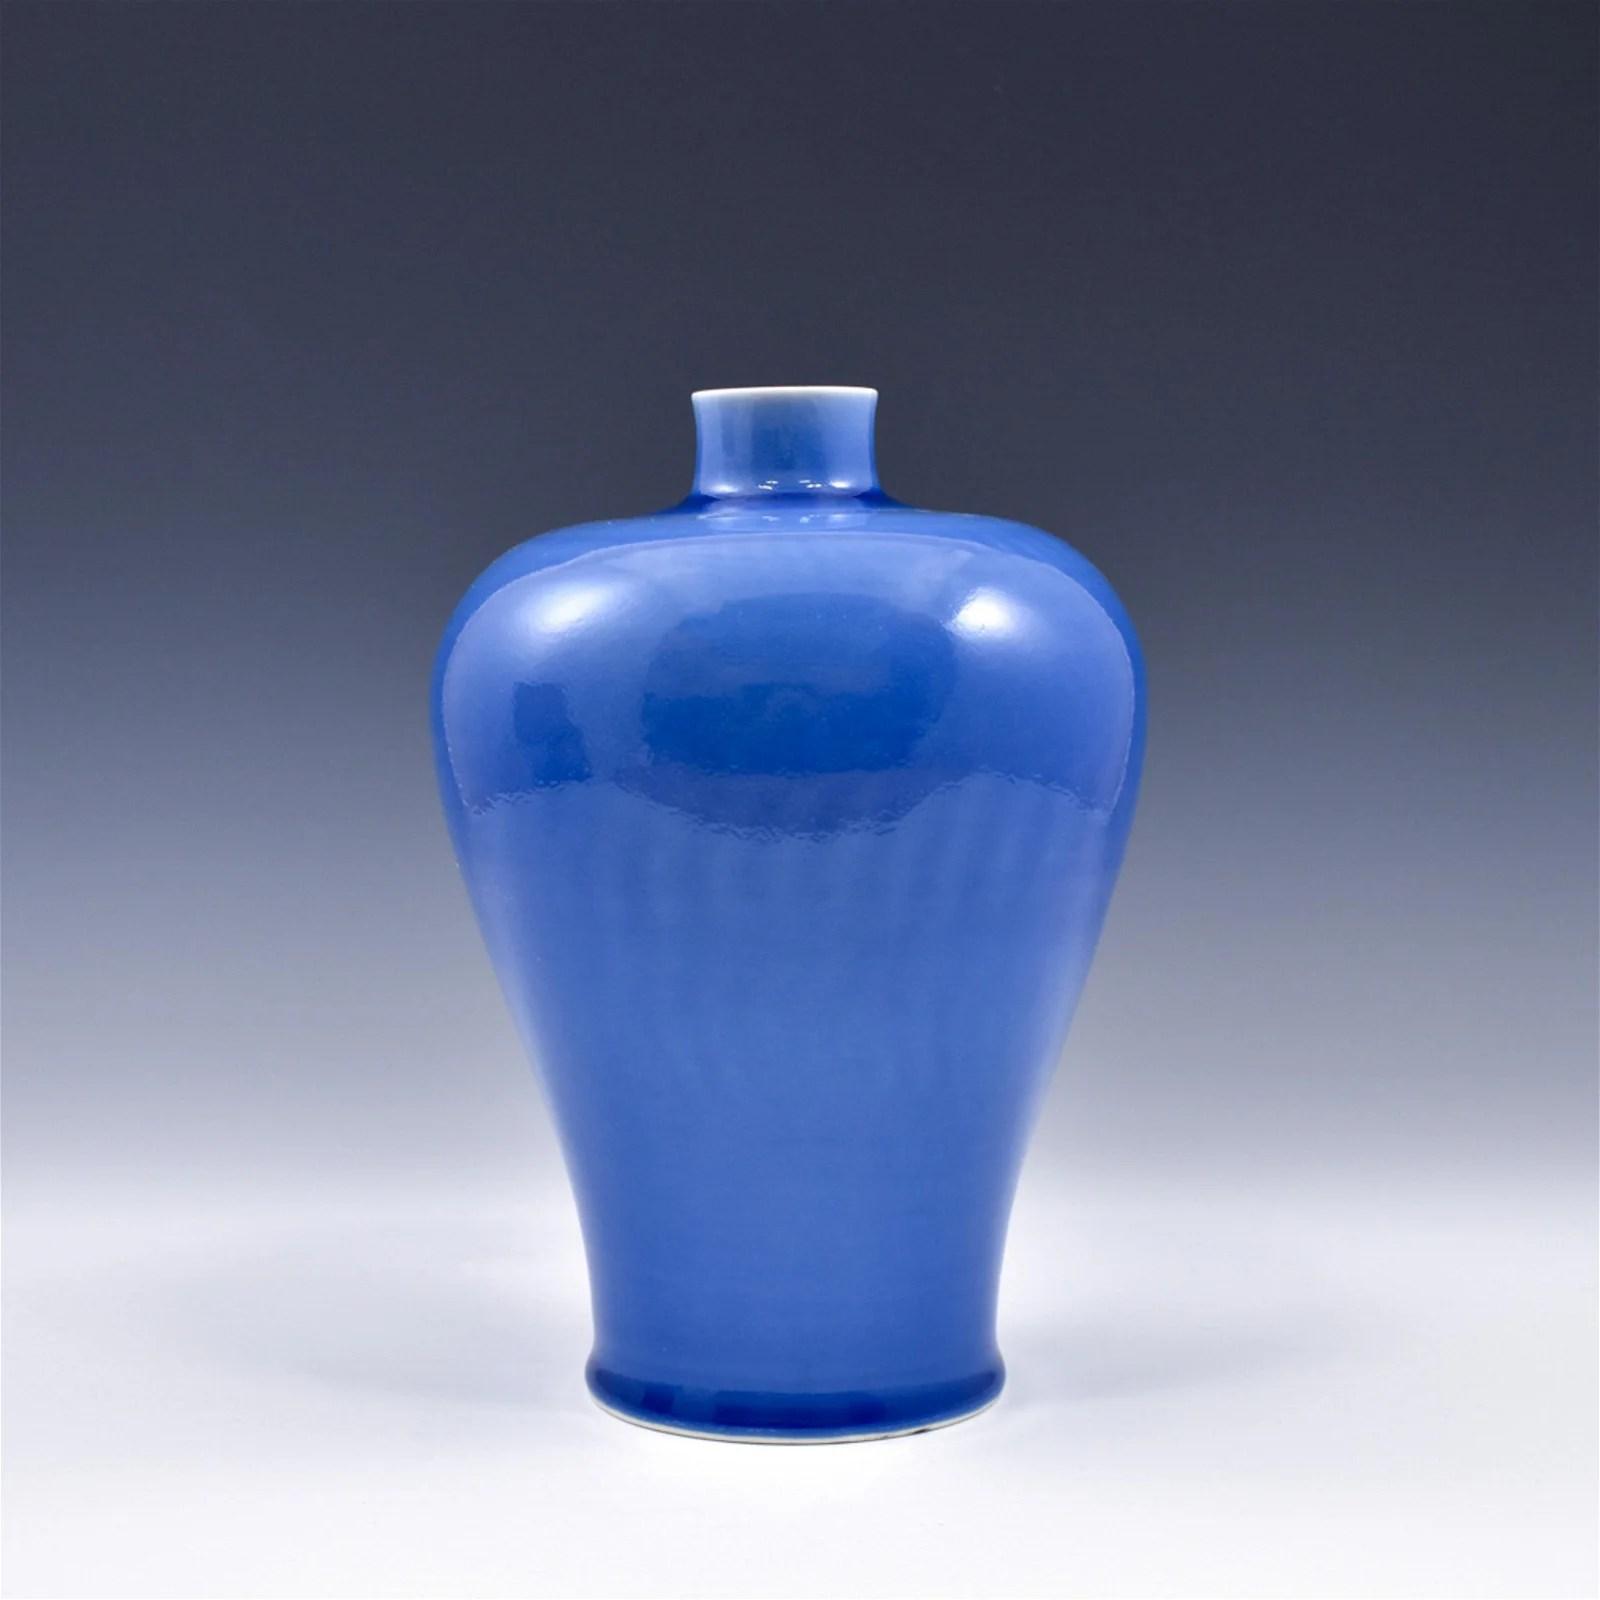 QIANLONG BLUE MONOCHROME MEIPING VASE